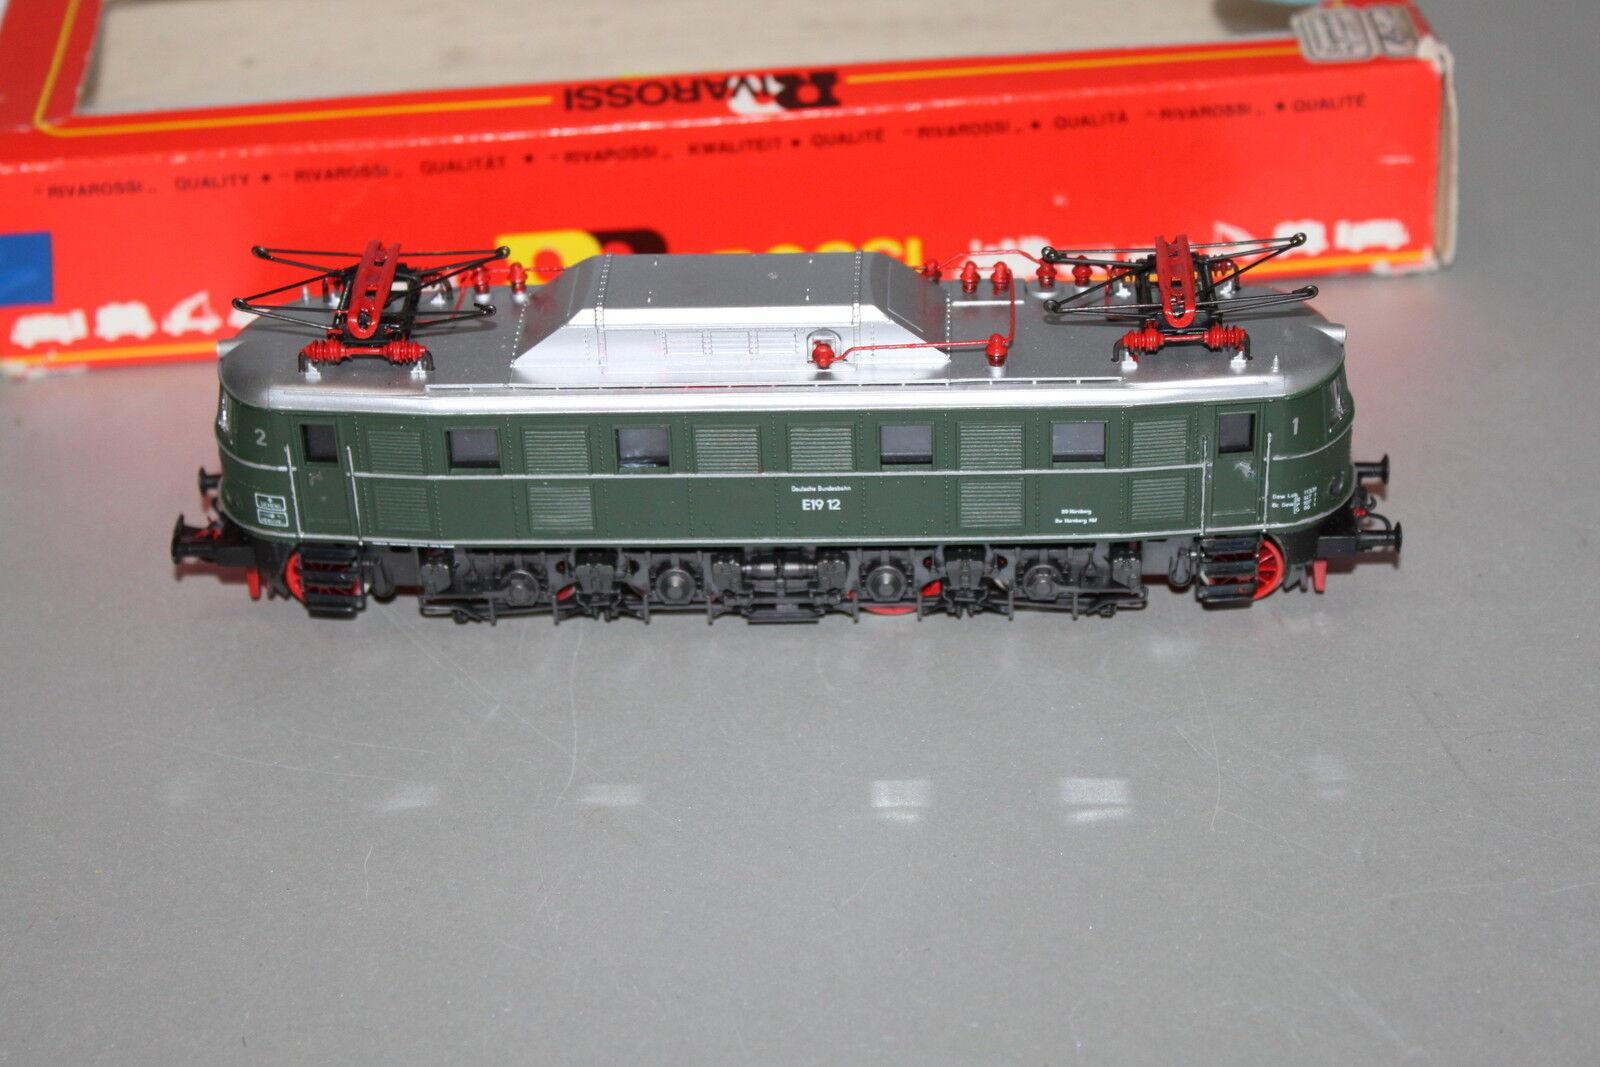 Rivarossi 1667 Locomotora Eléctrica Serie E19 12DB verde Escala H0 Emb.orig